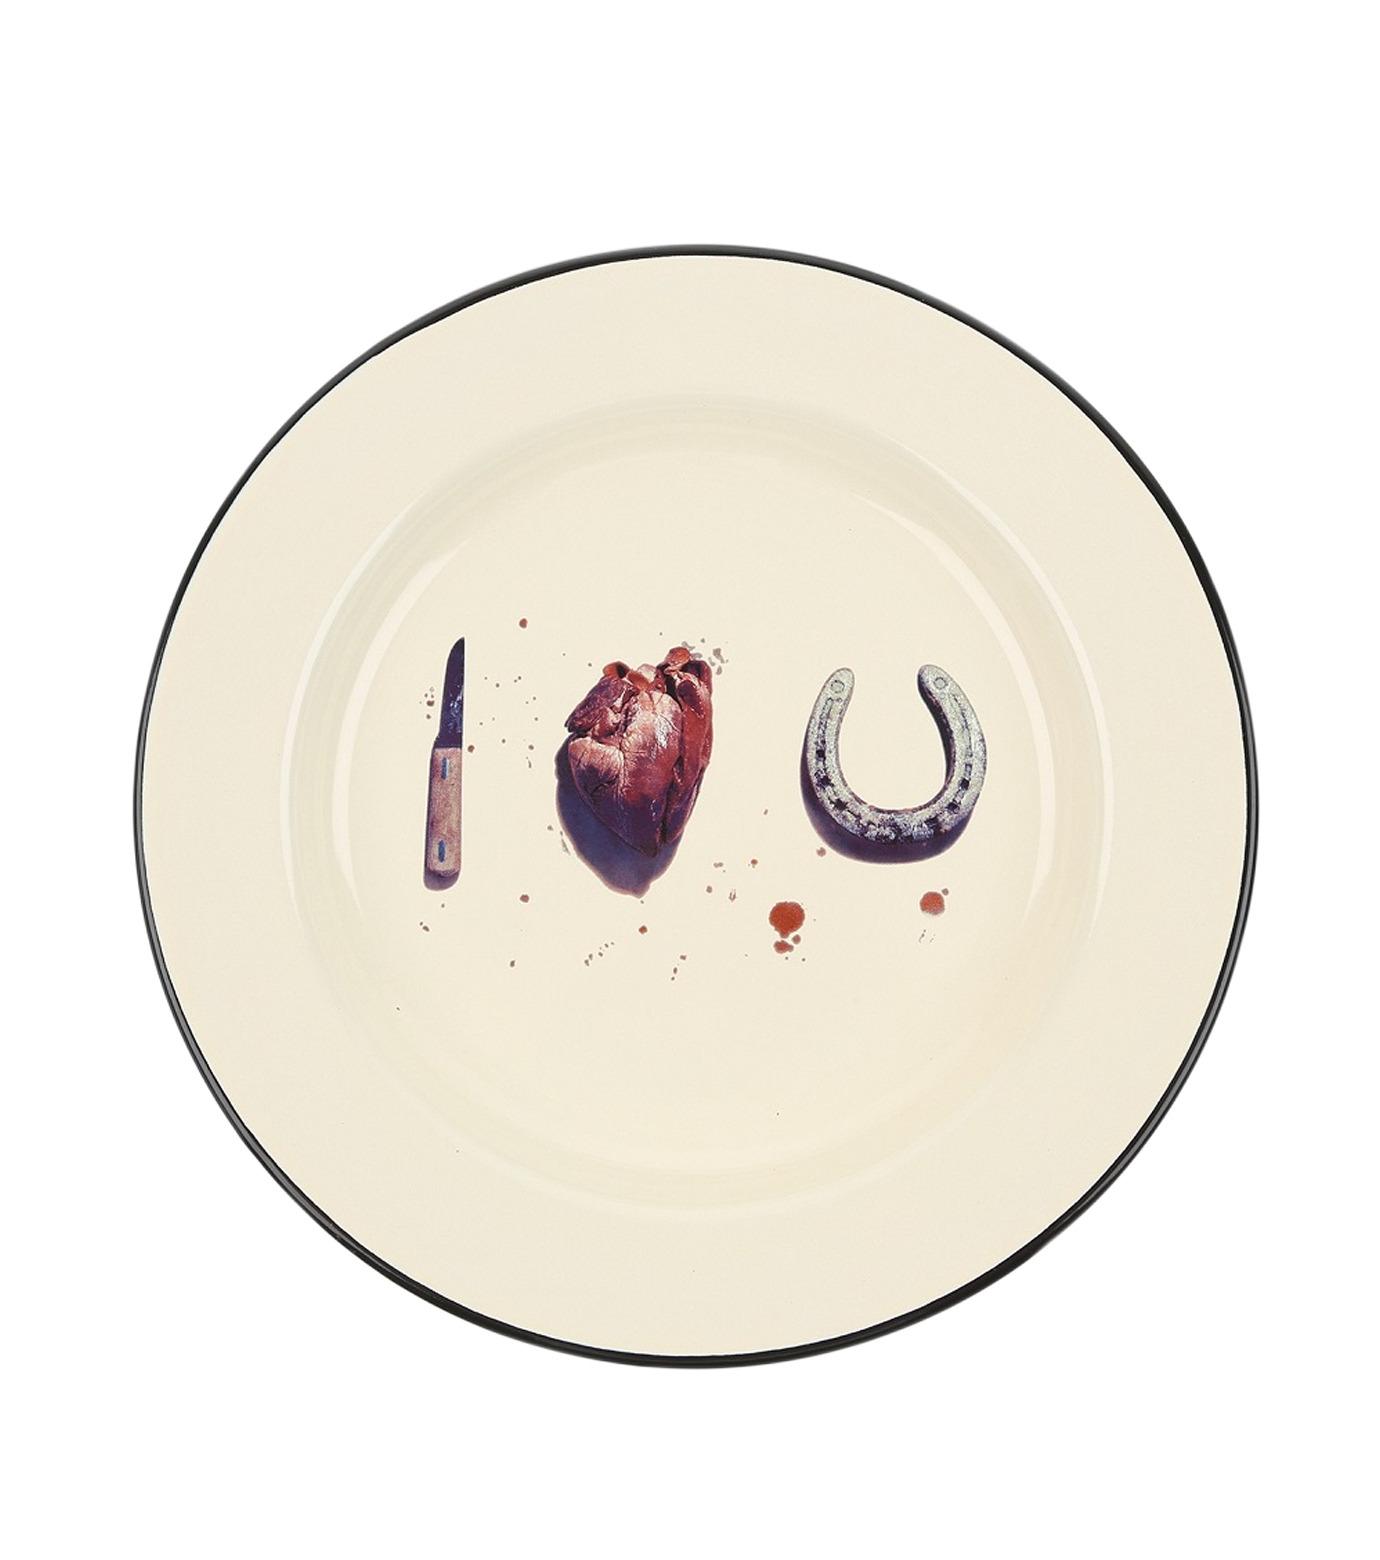 Seletti(セレッティ)のEnamel Plate -I Love You--NONE(キッチン/kitchen)-126176-0 拡大詳細画像1